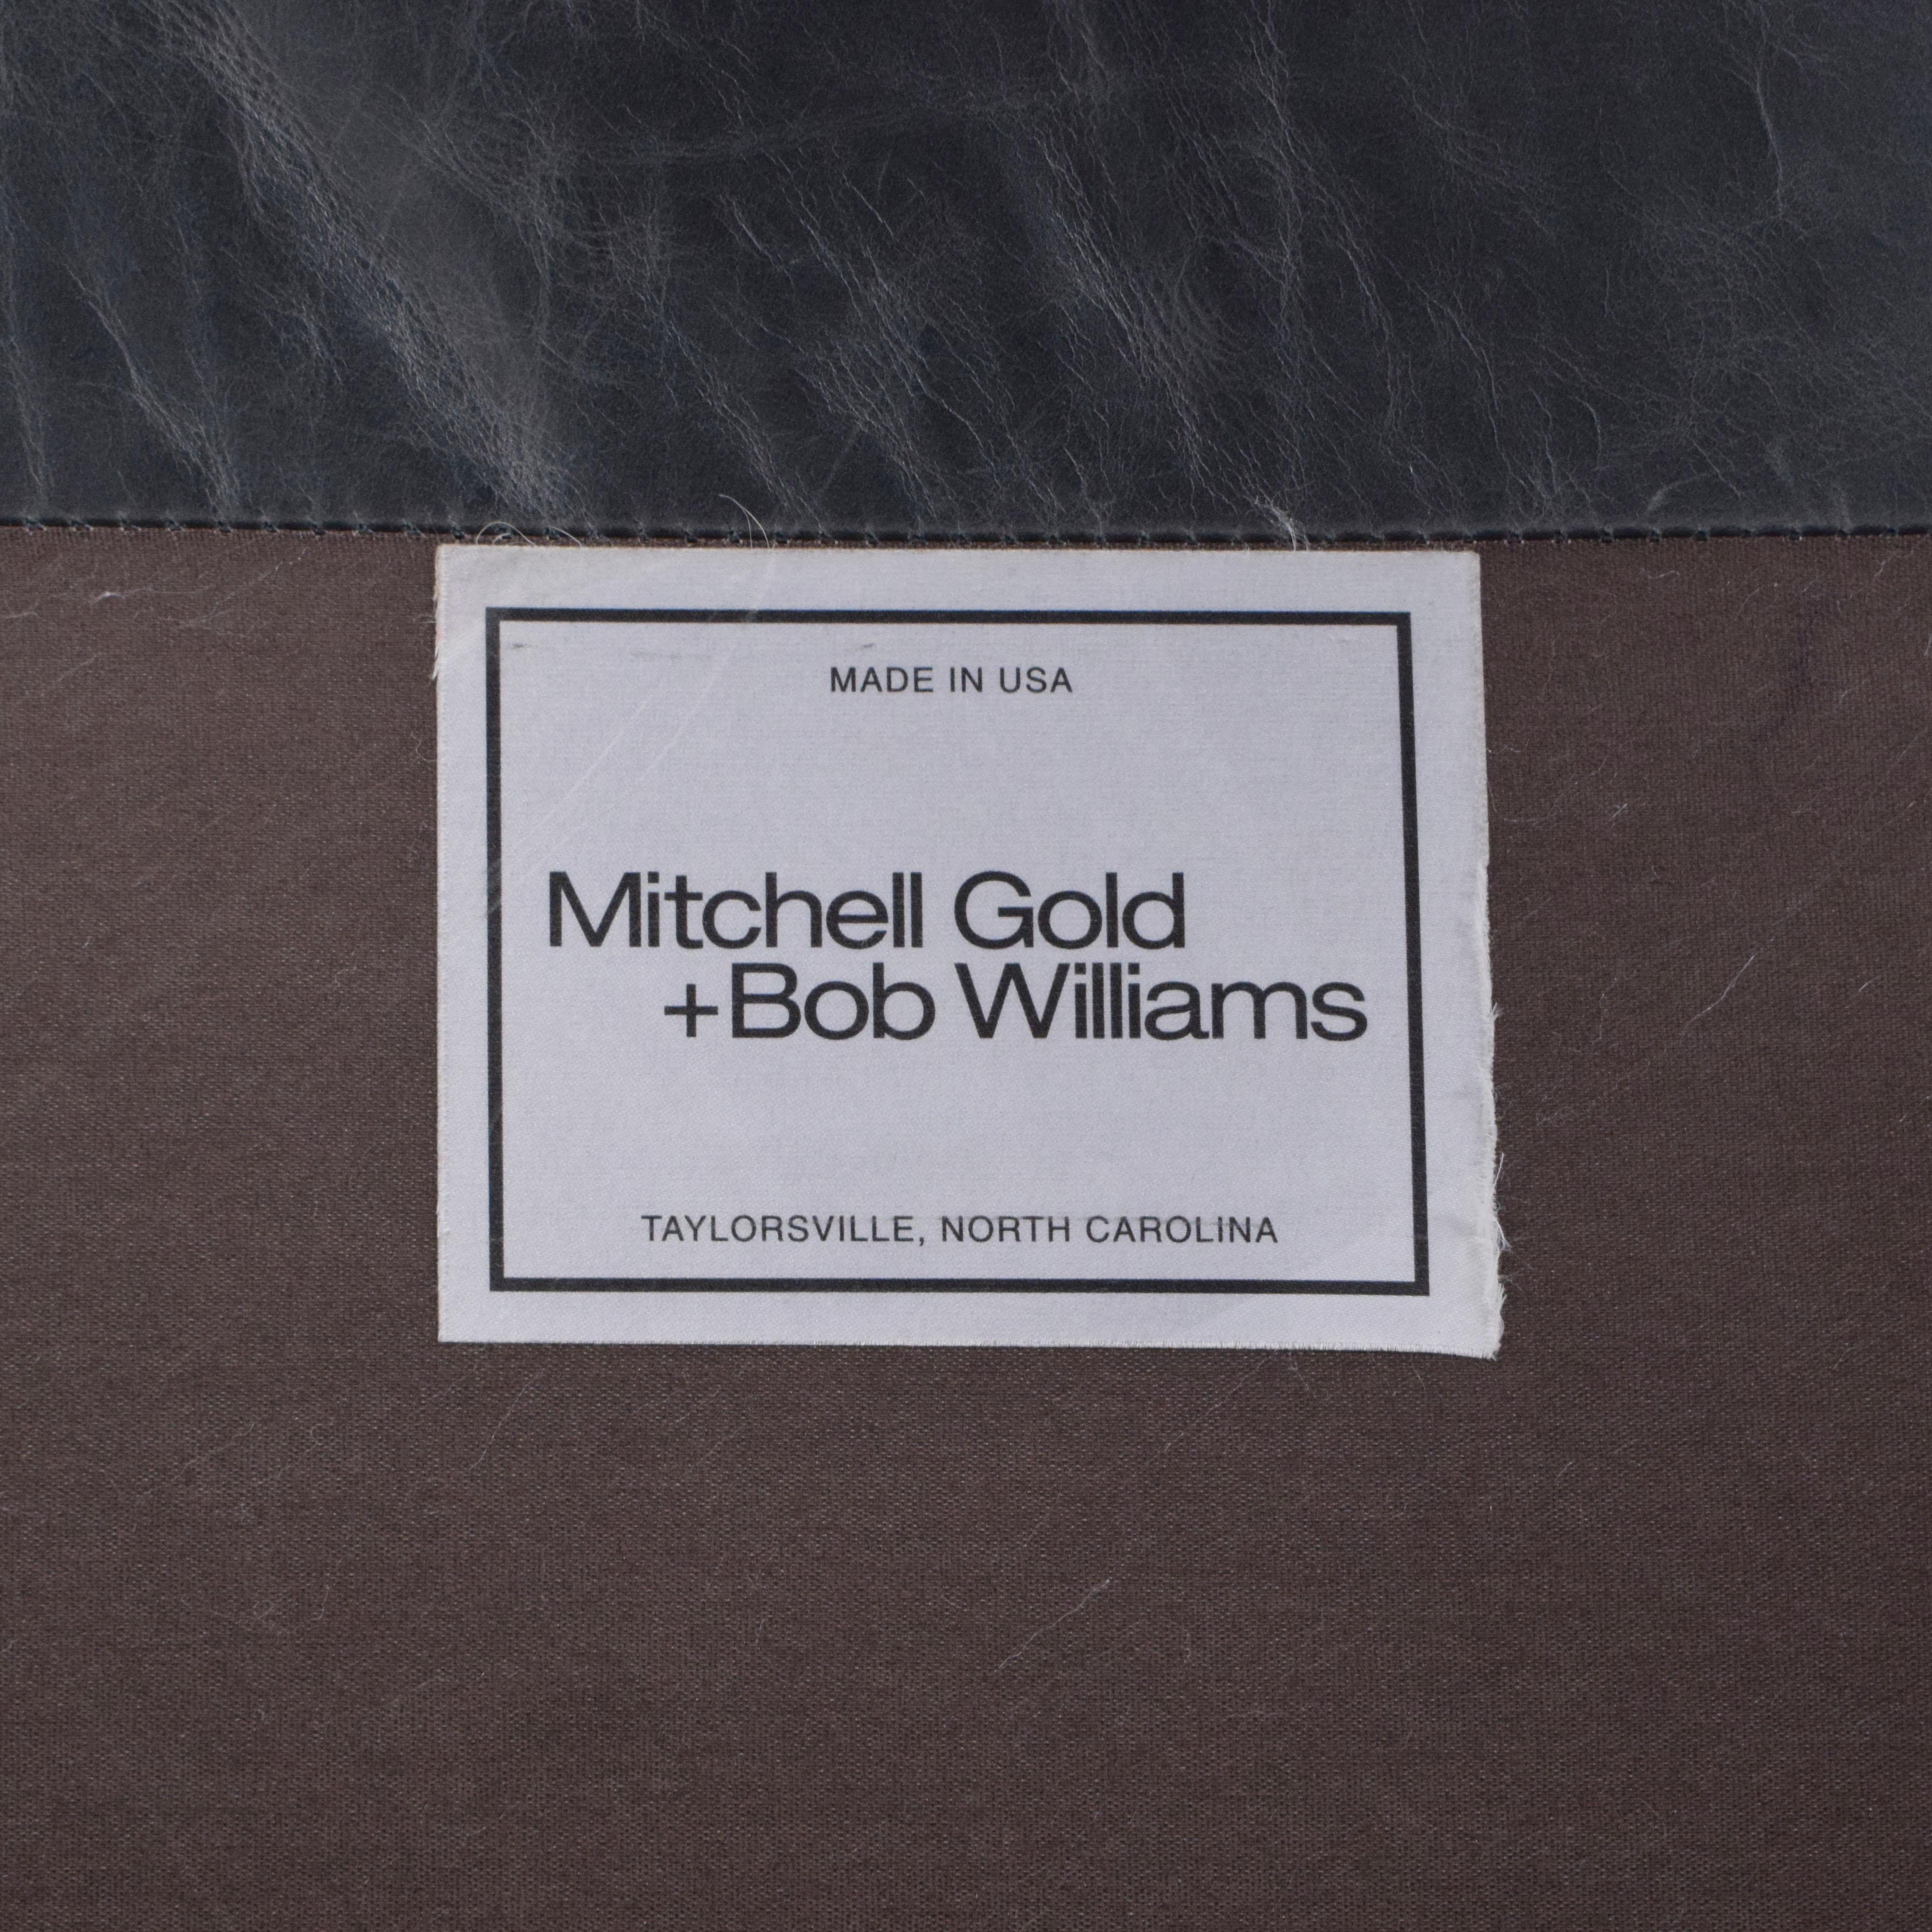 Mitchell Gold + Bob Williams Square Ottoman / Chairs